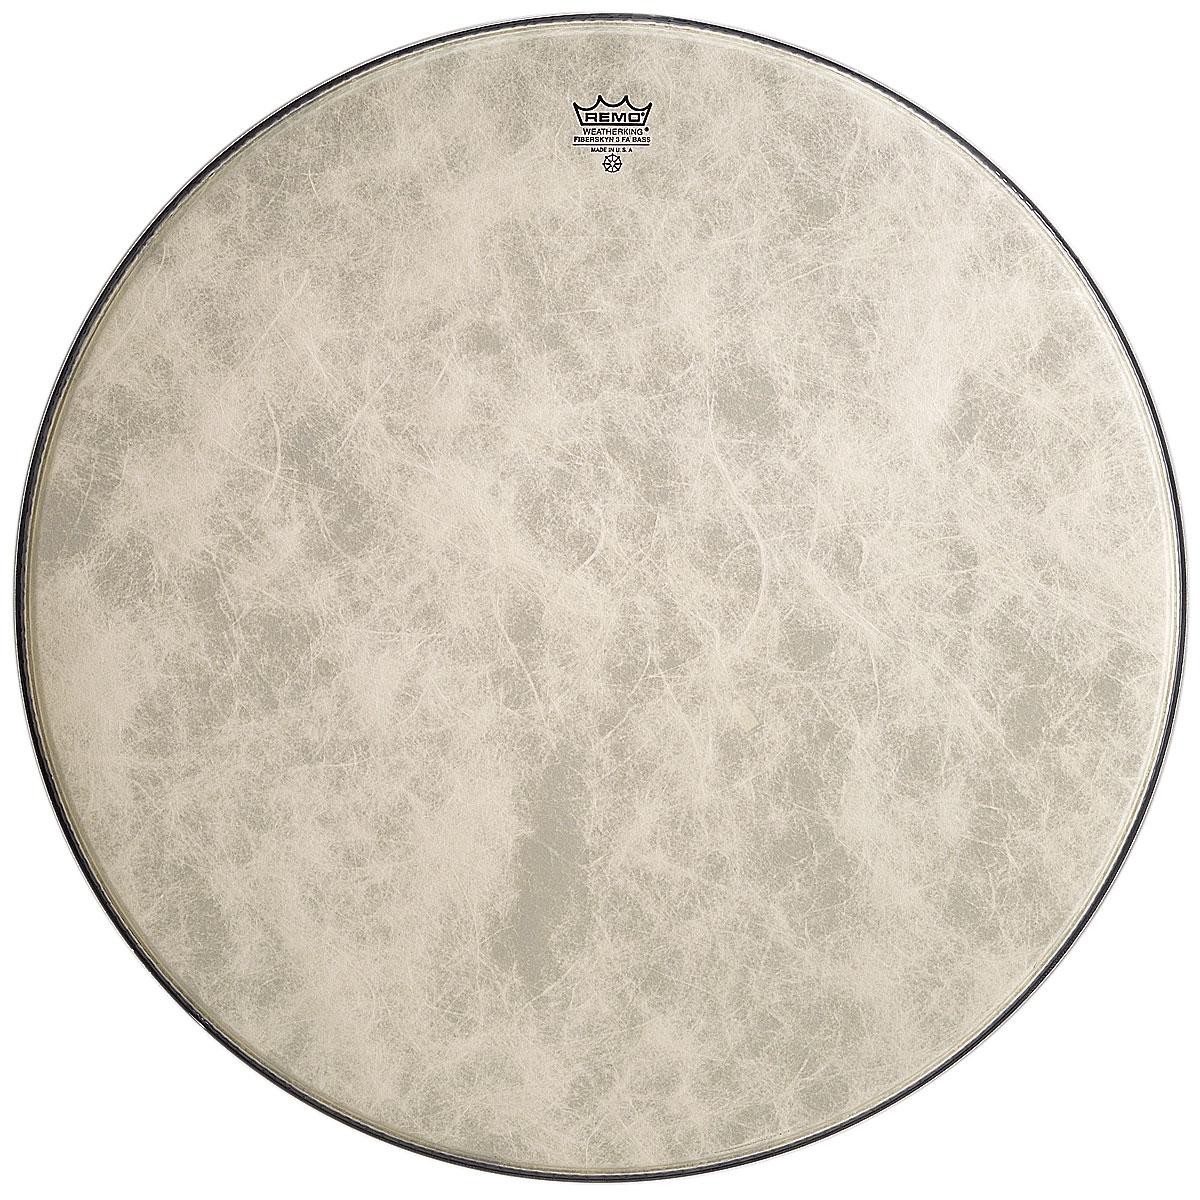 Remo FA1524 bass drum fiberskyn